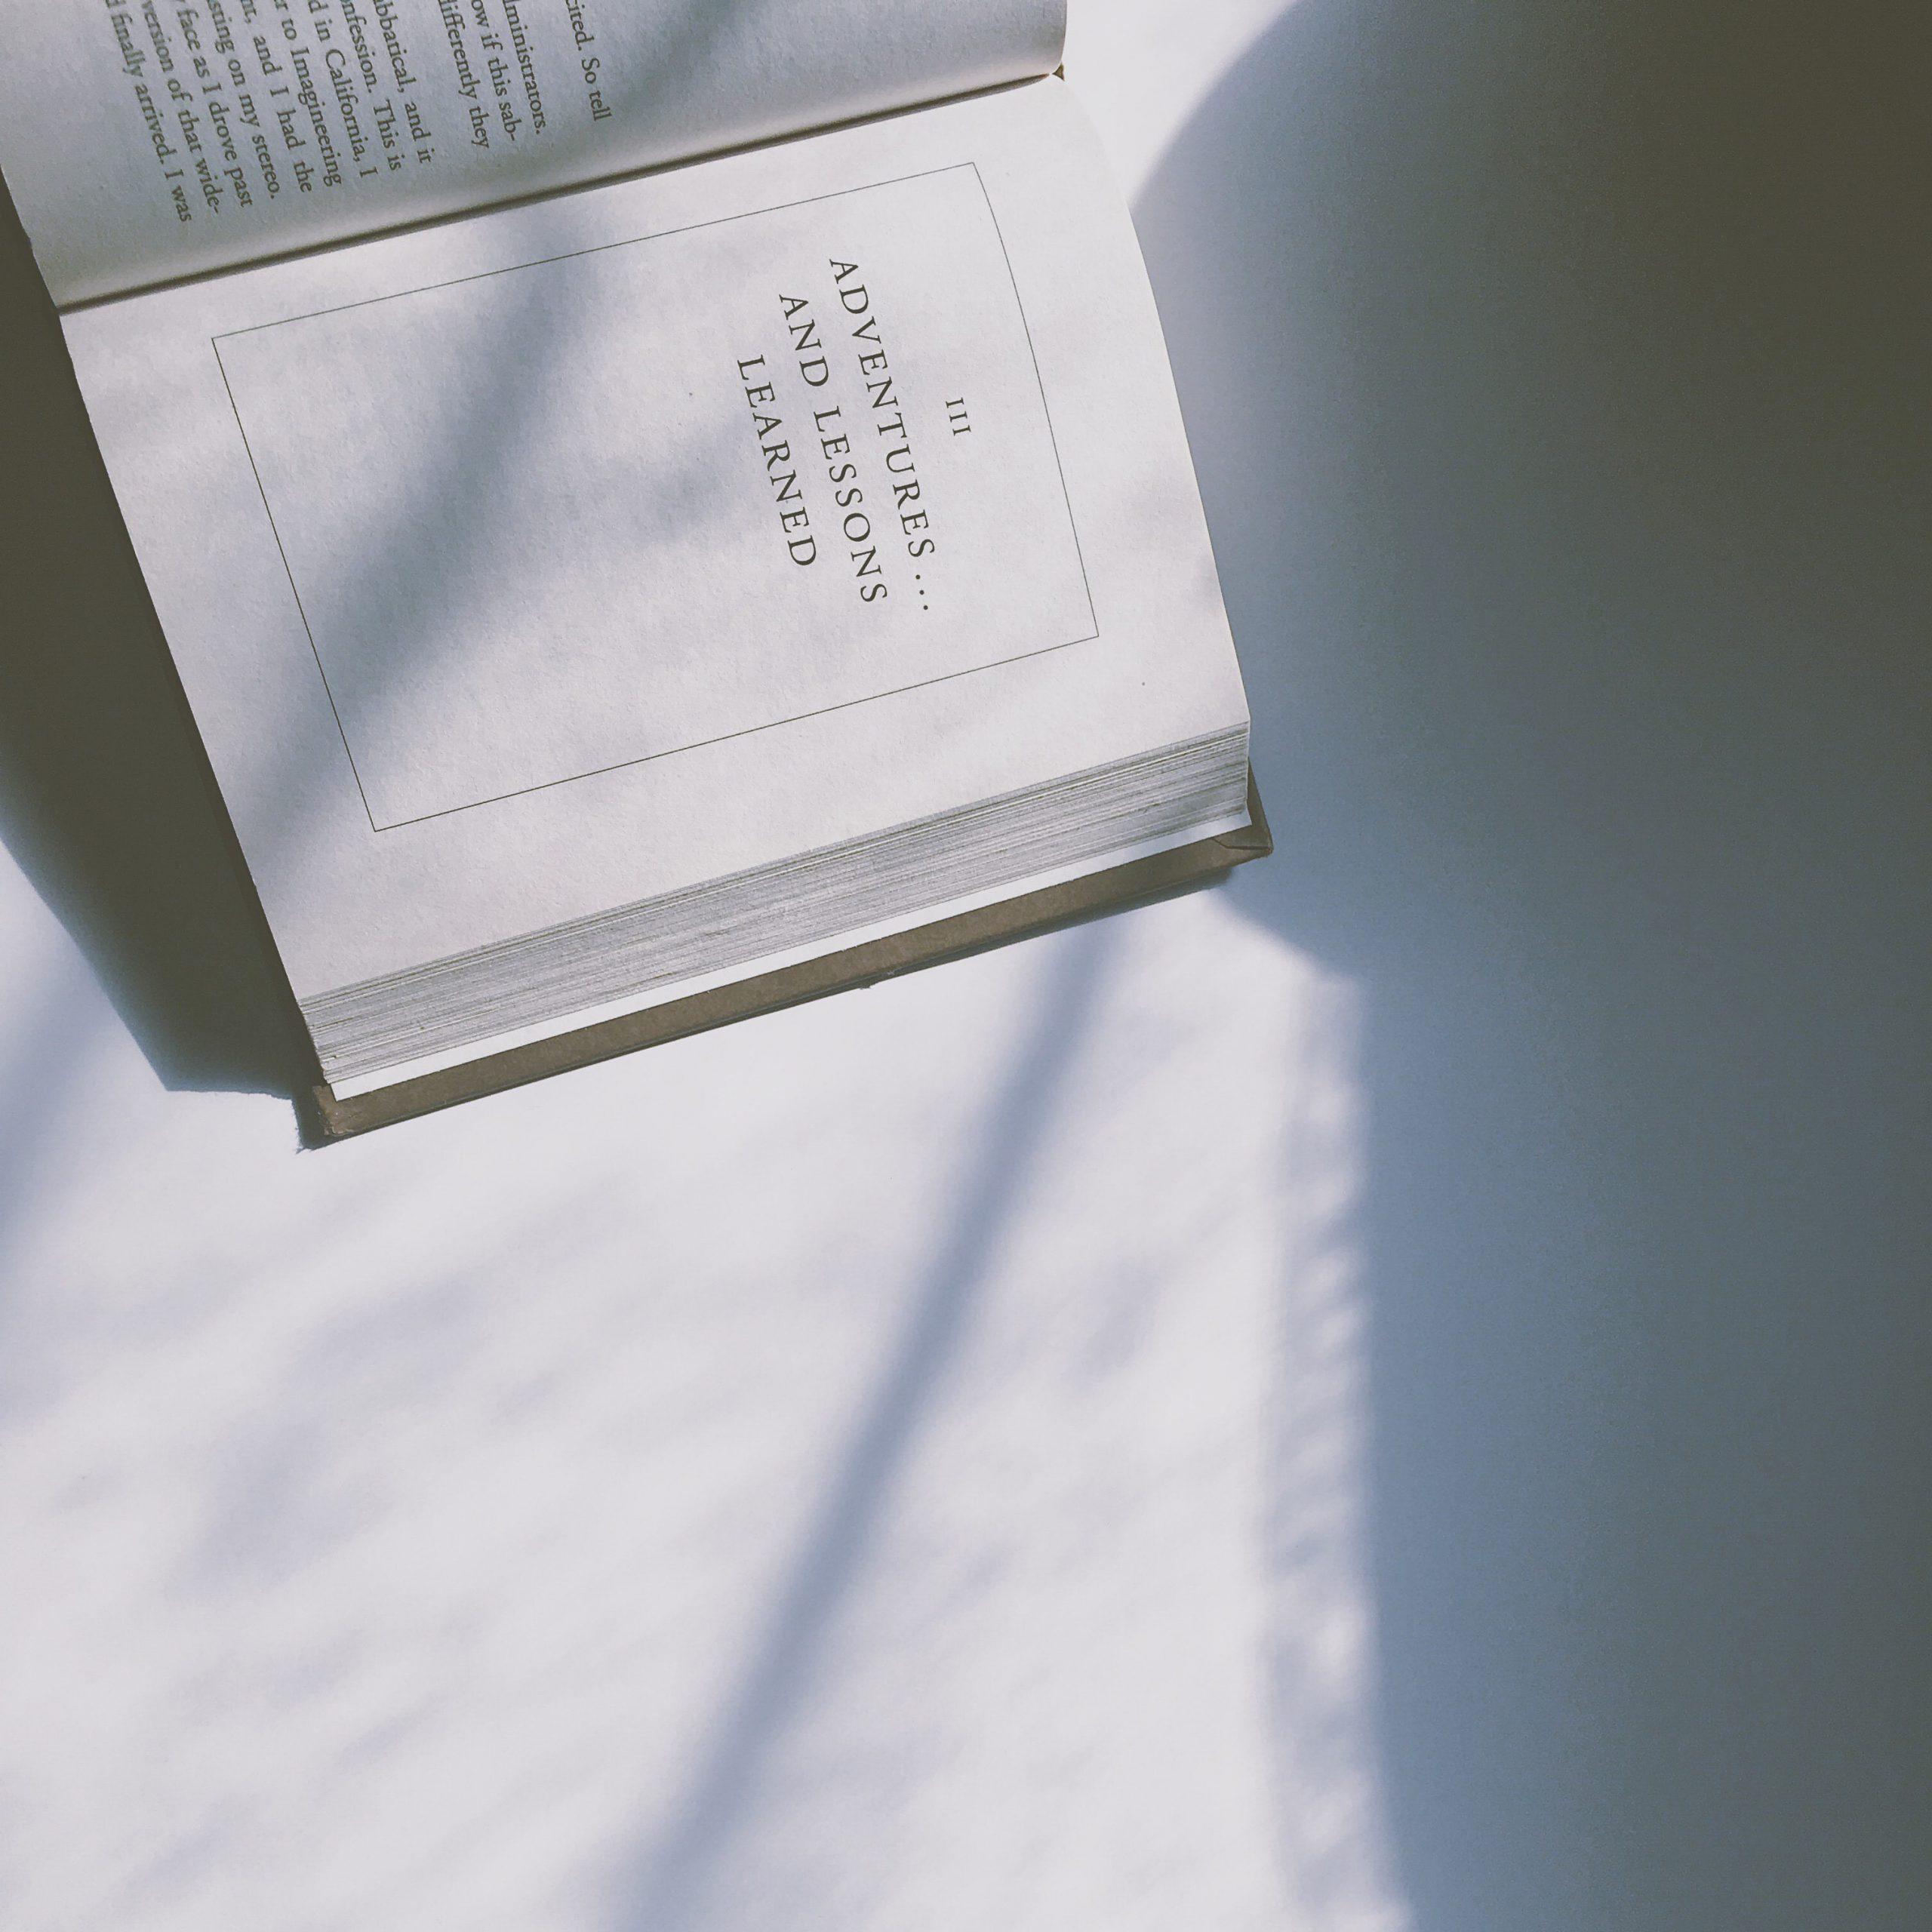 In der Welt der Poetry